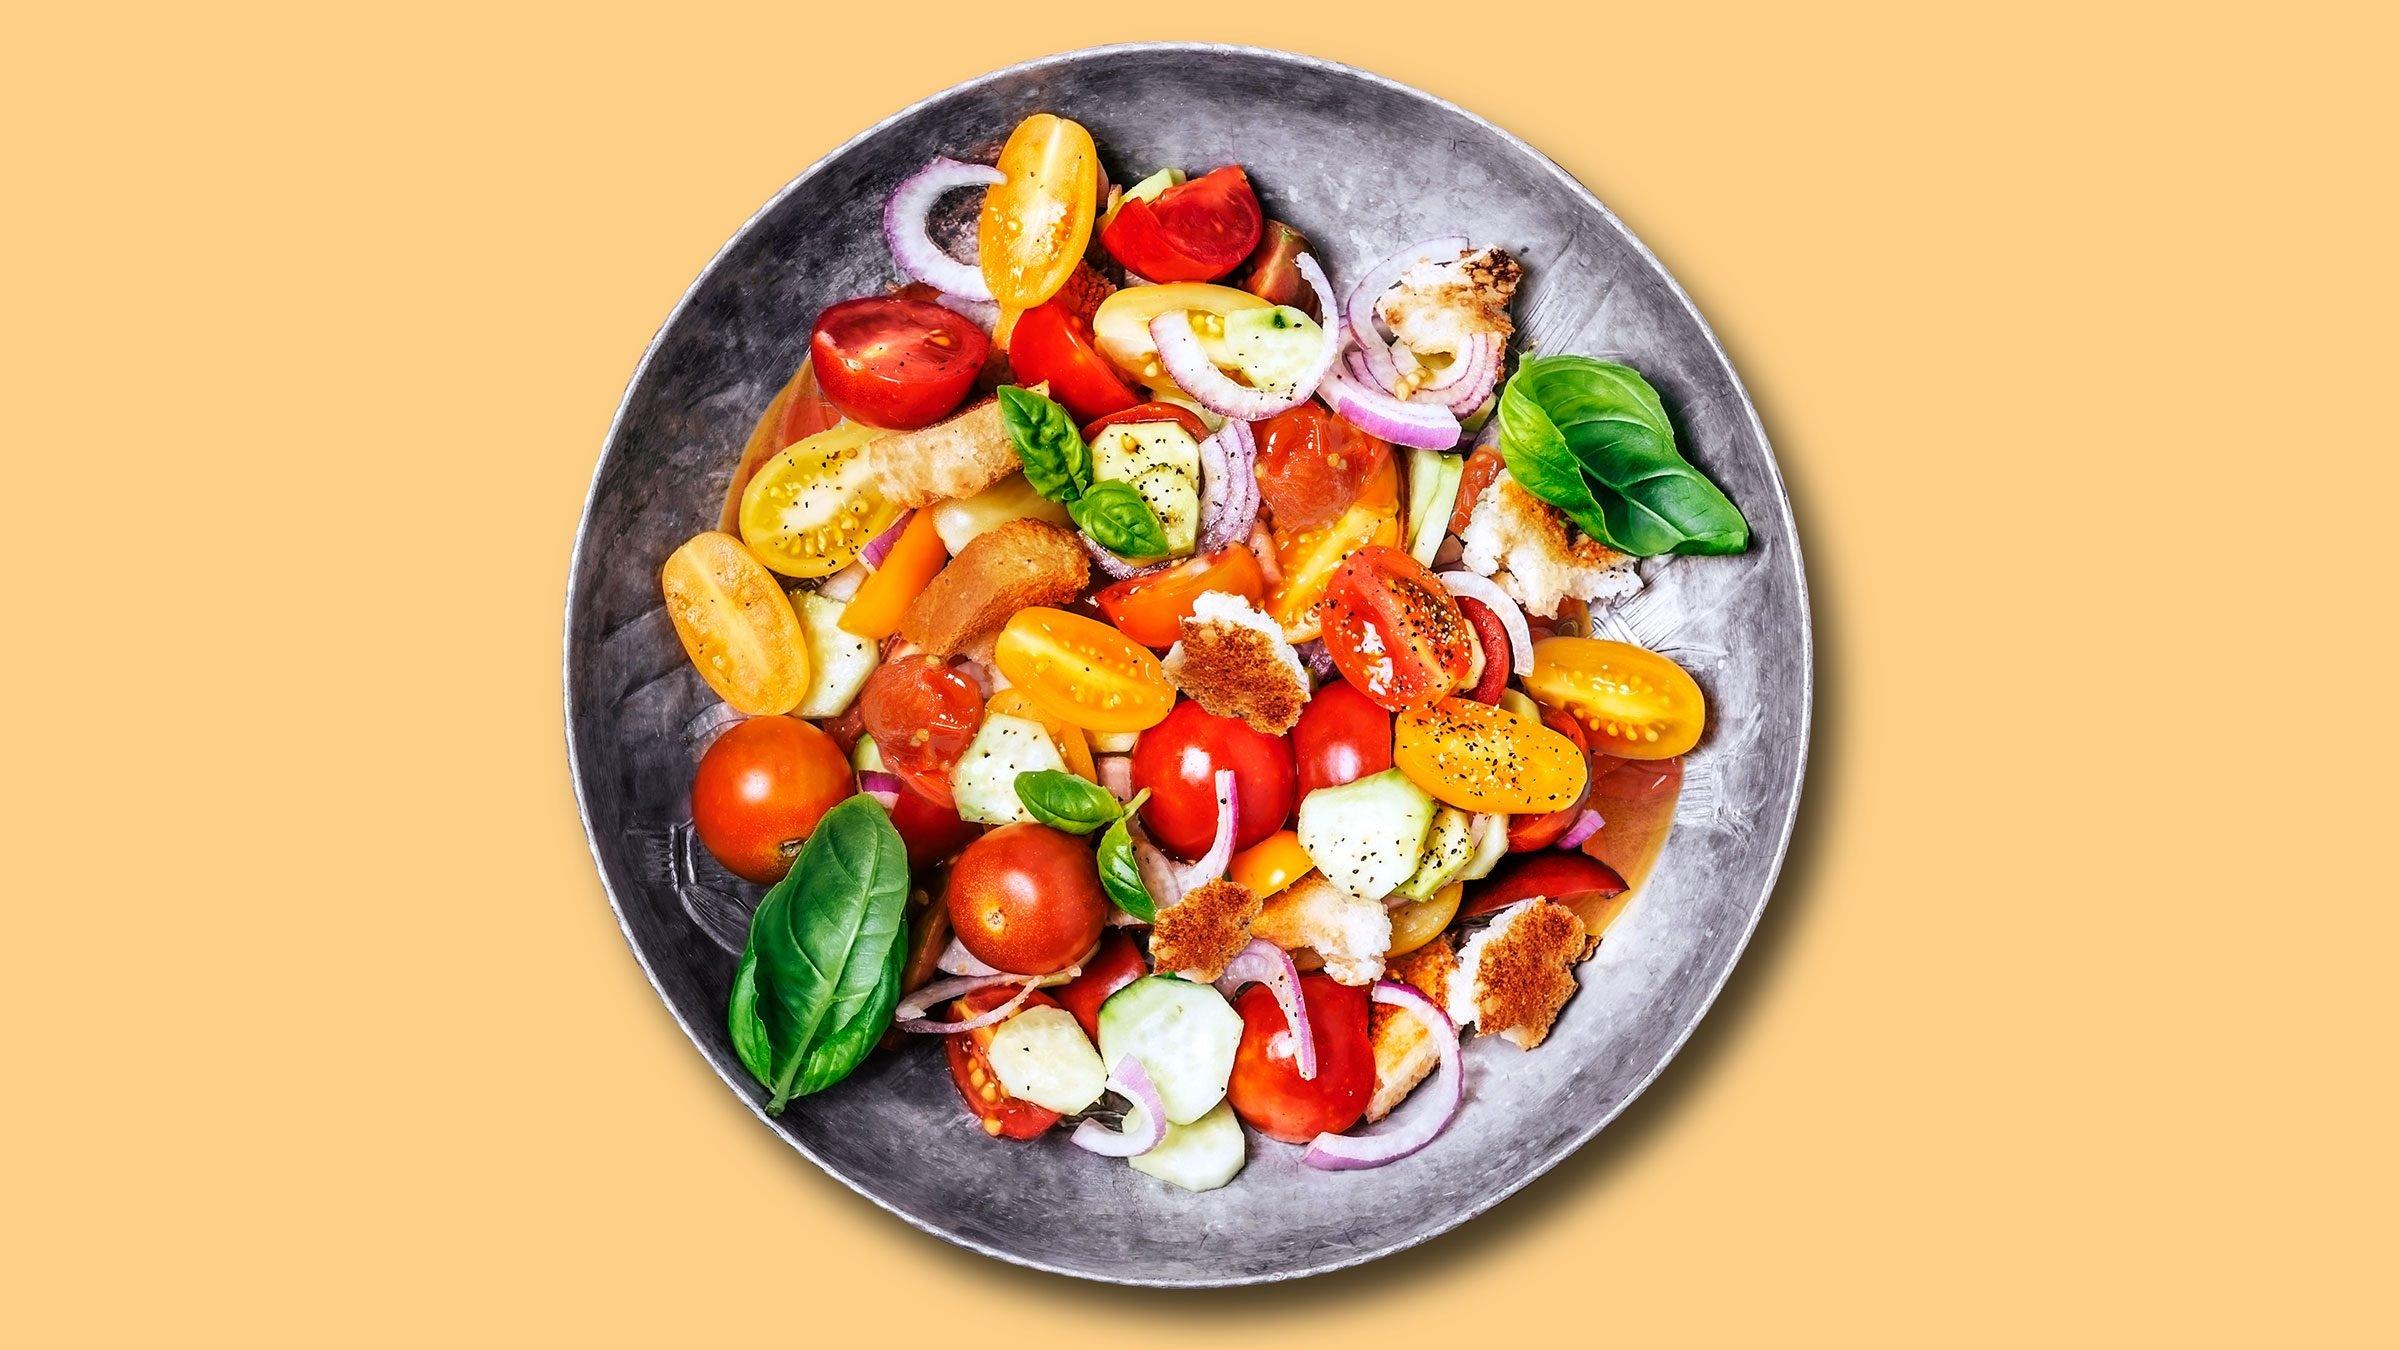 tomato salad inspiration